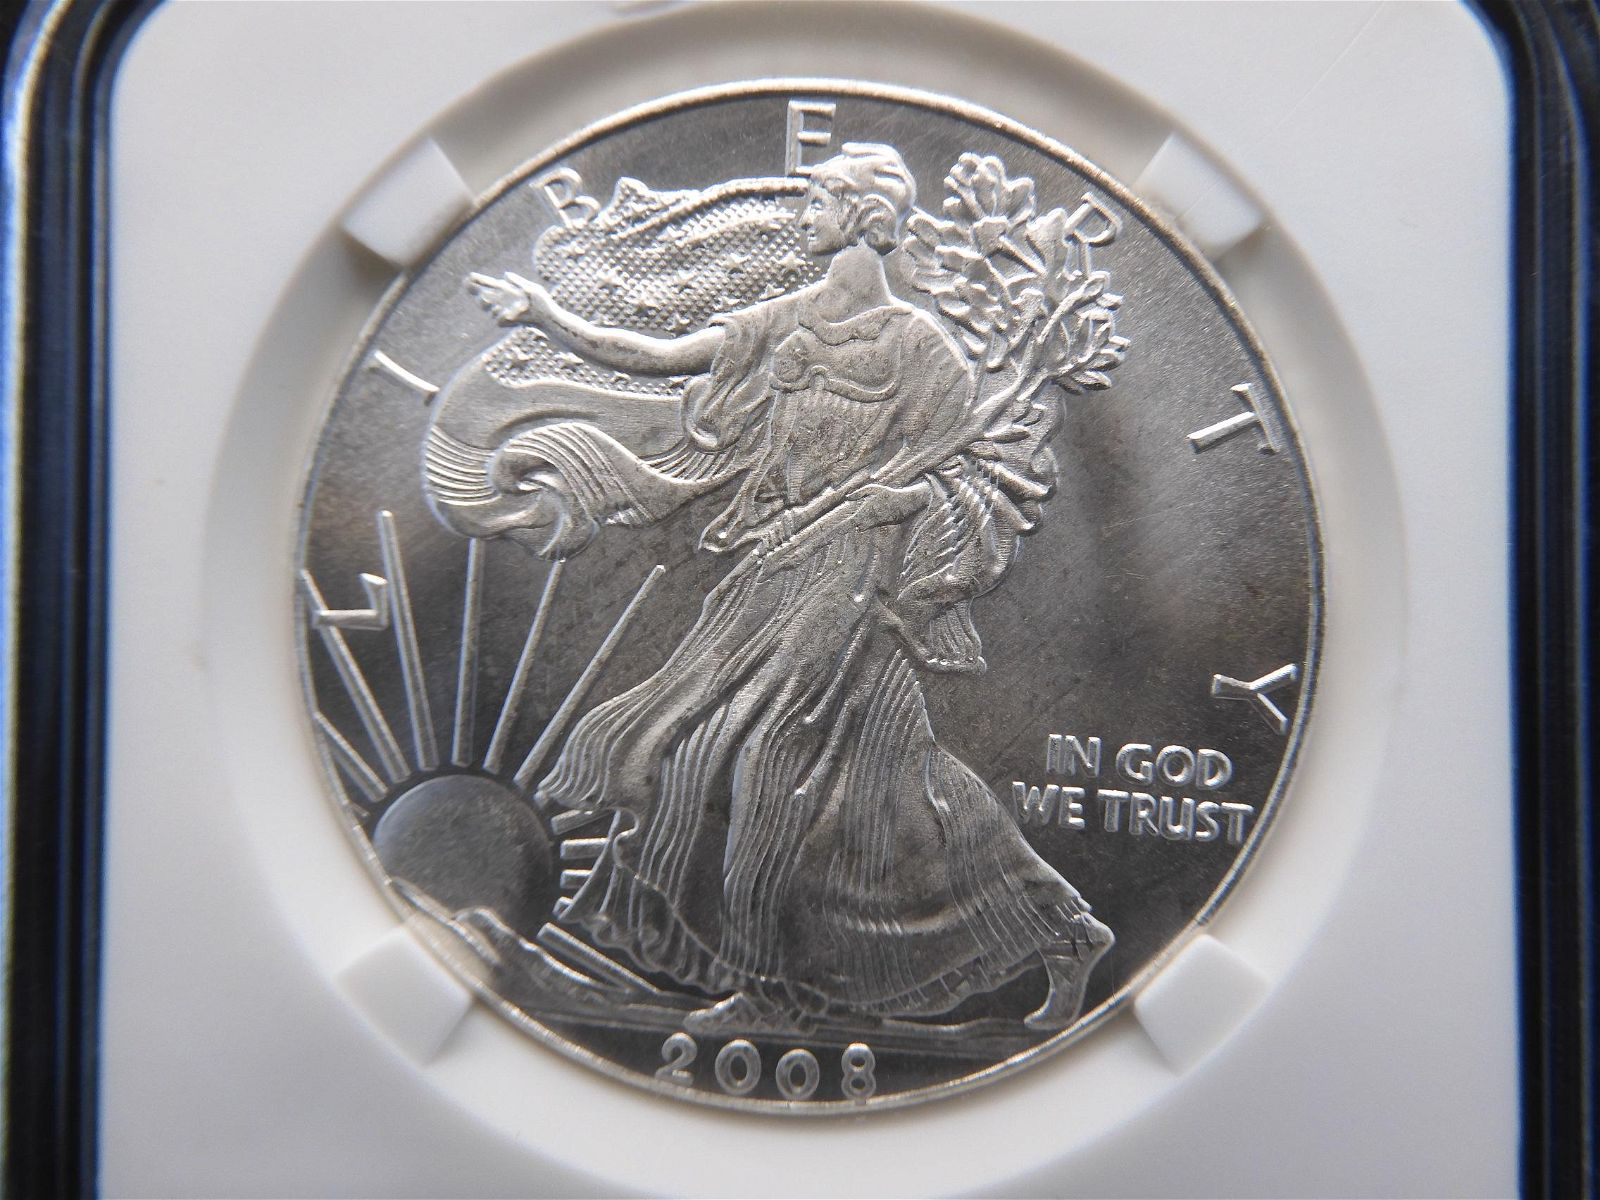 2008 American Silver Eagle .1 Troy oz .999 Fine Silver